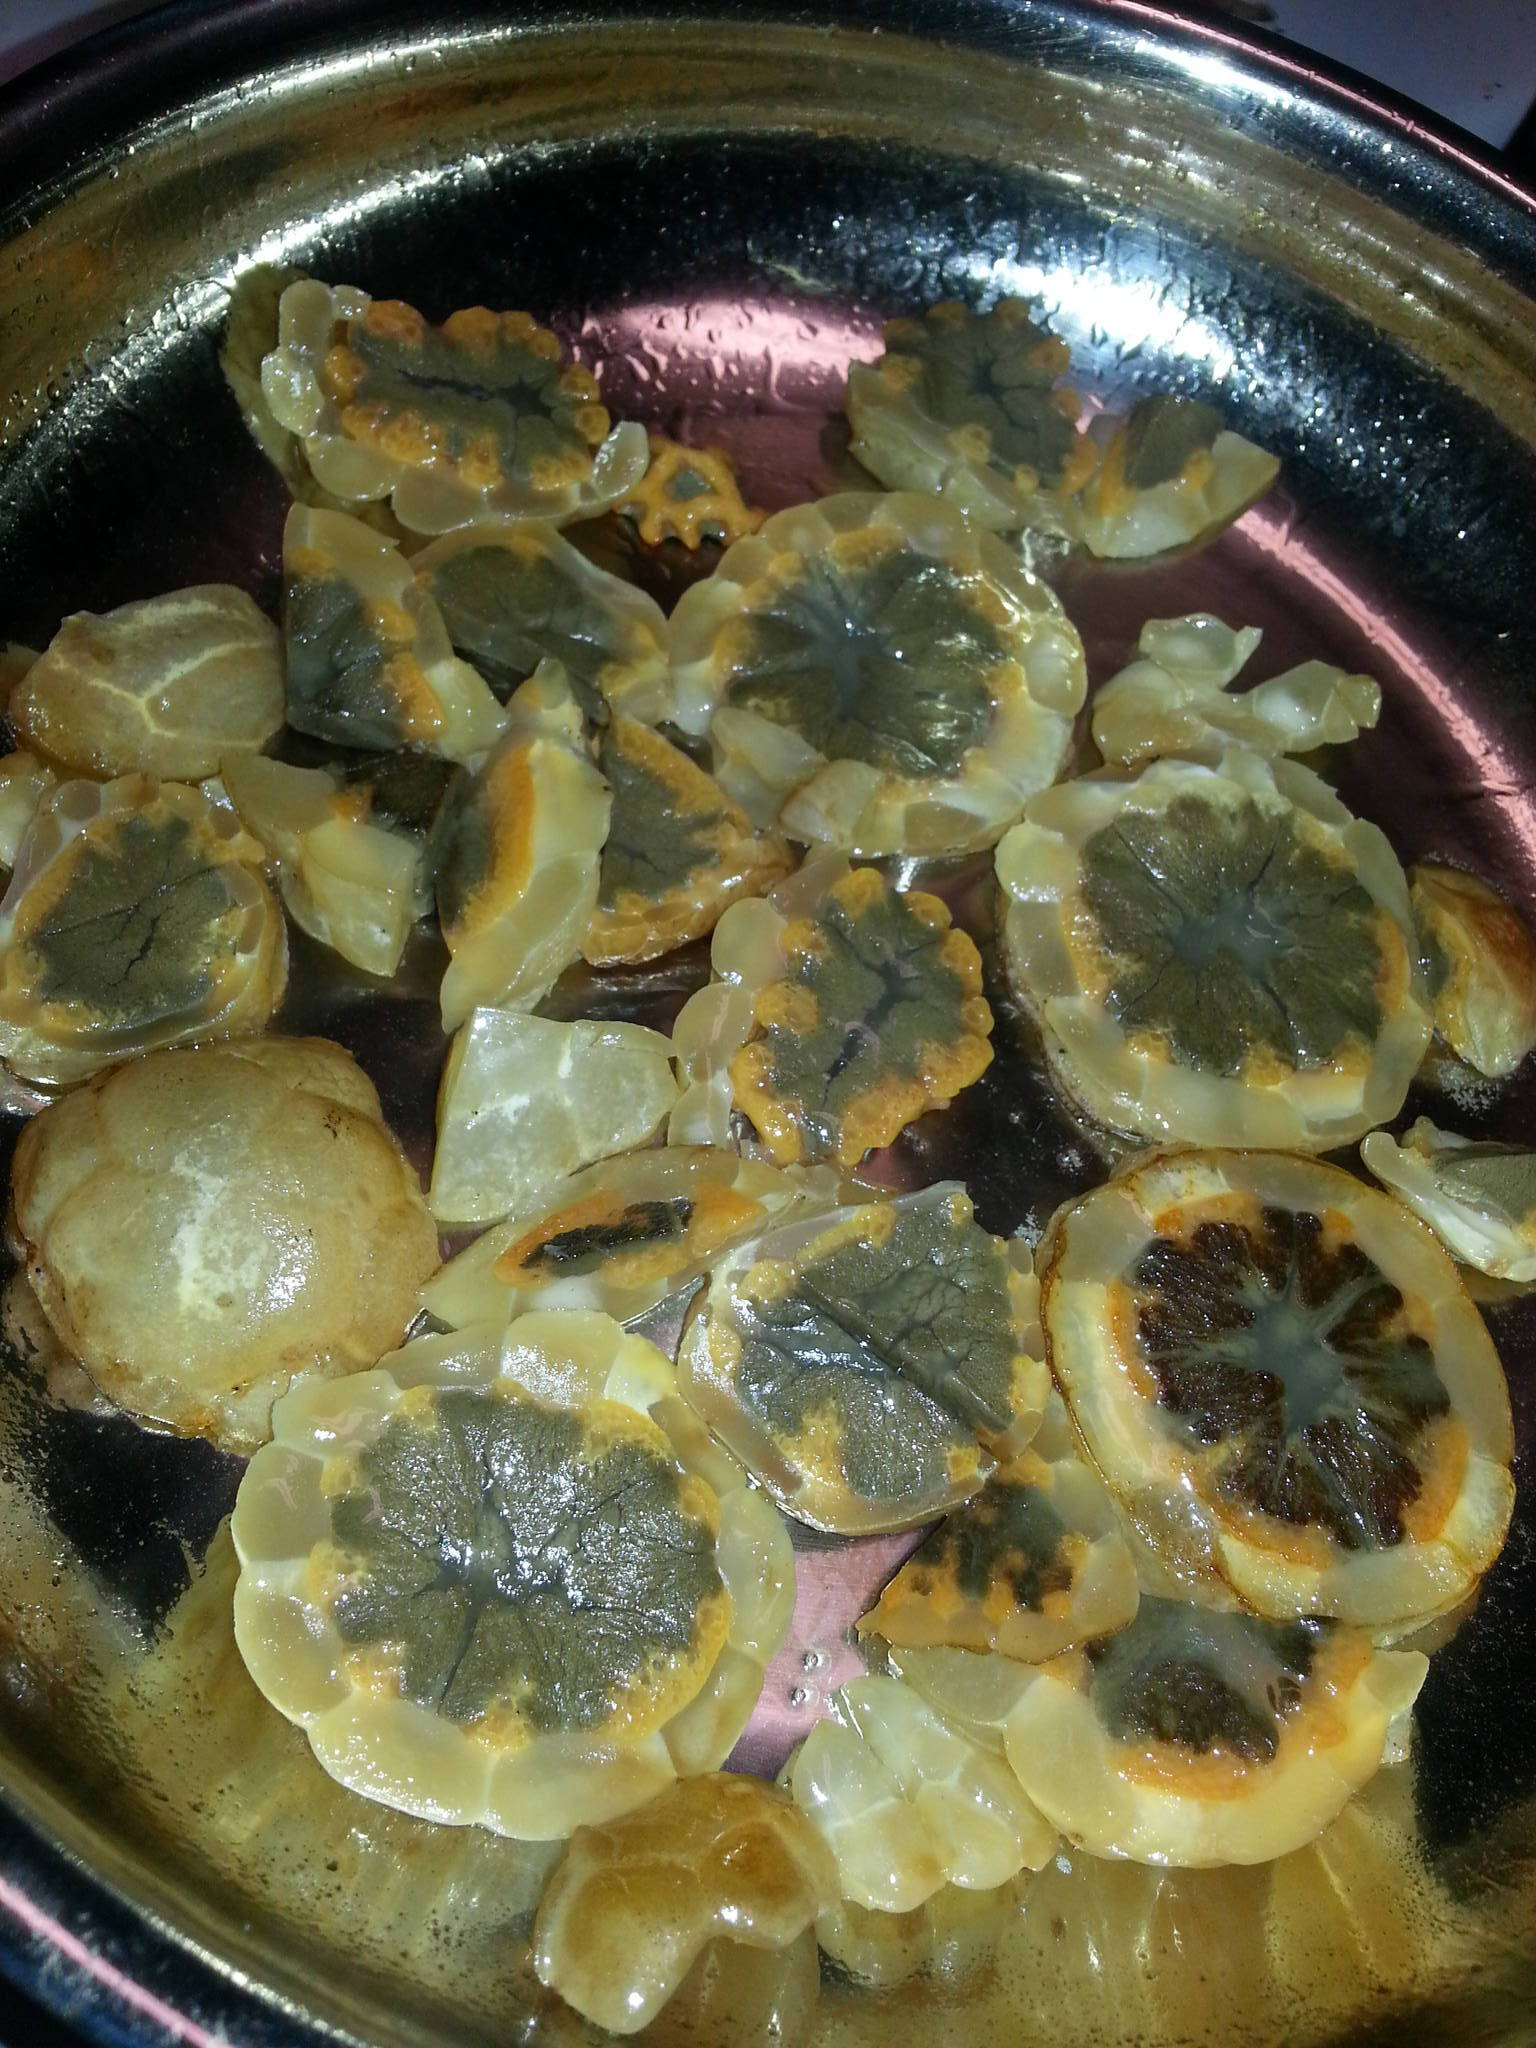 So i ate a Clathrus ruber egg    - Mushroom Hunting and